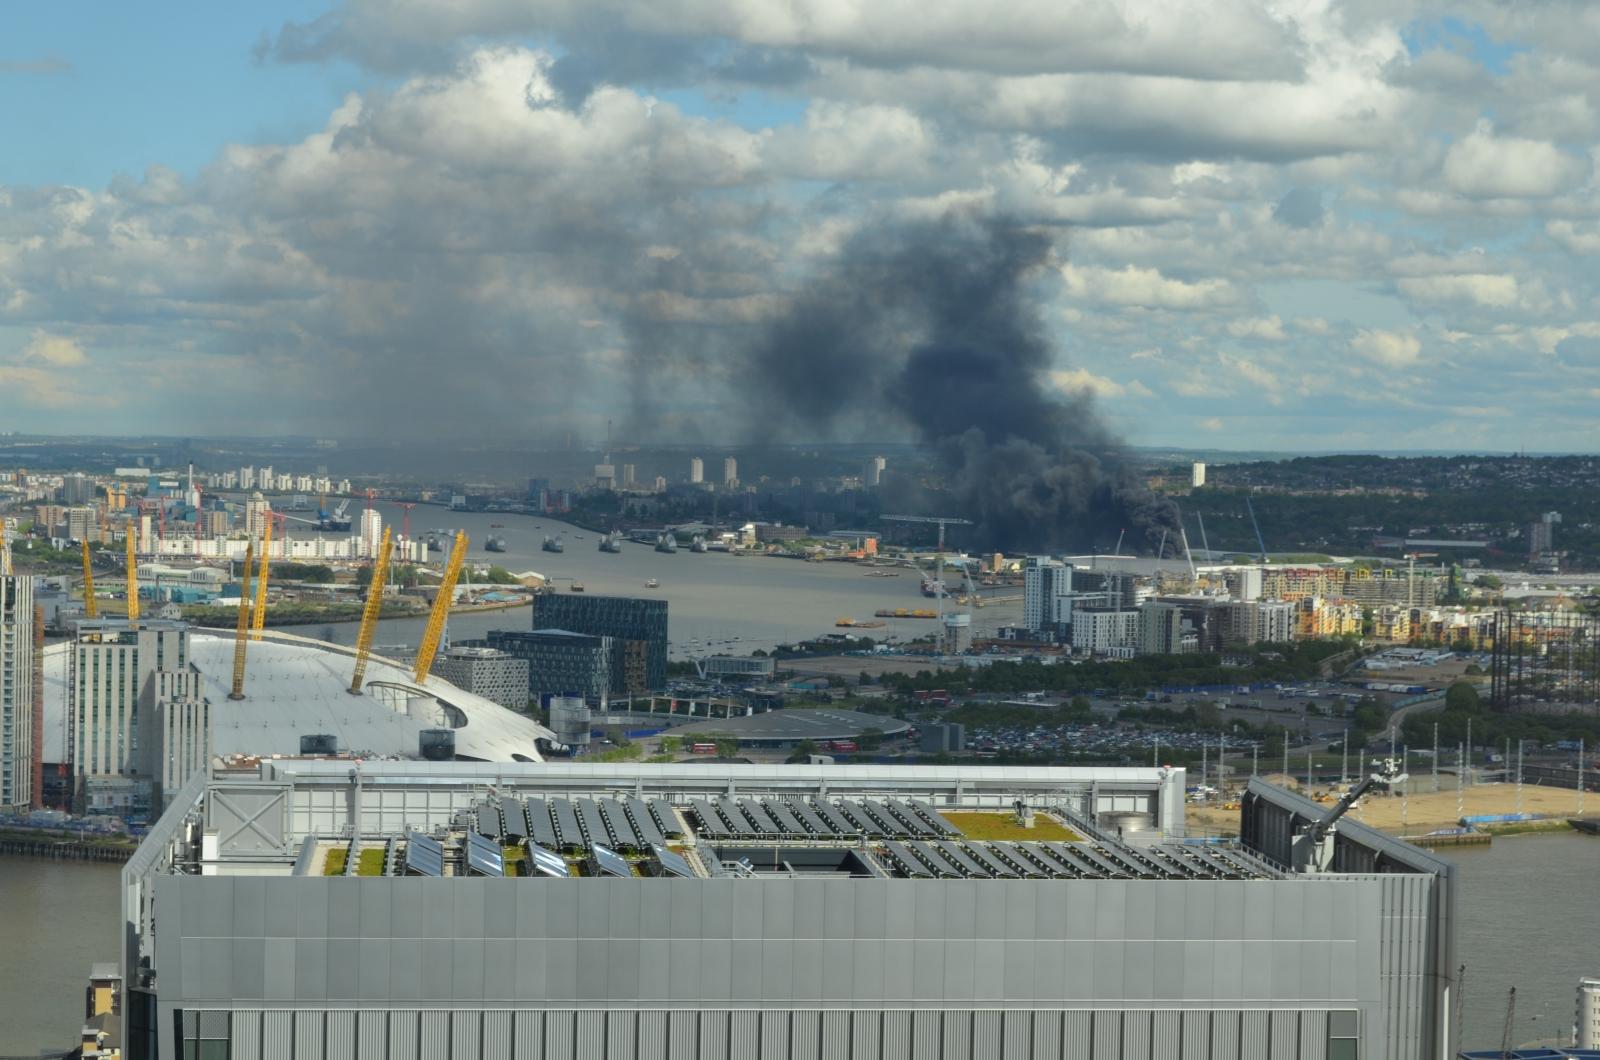 Charlton fire